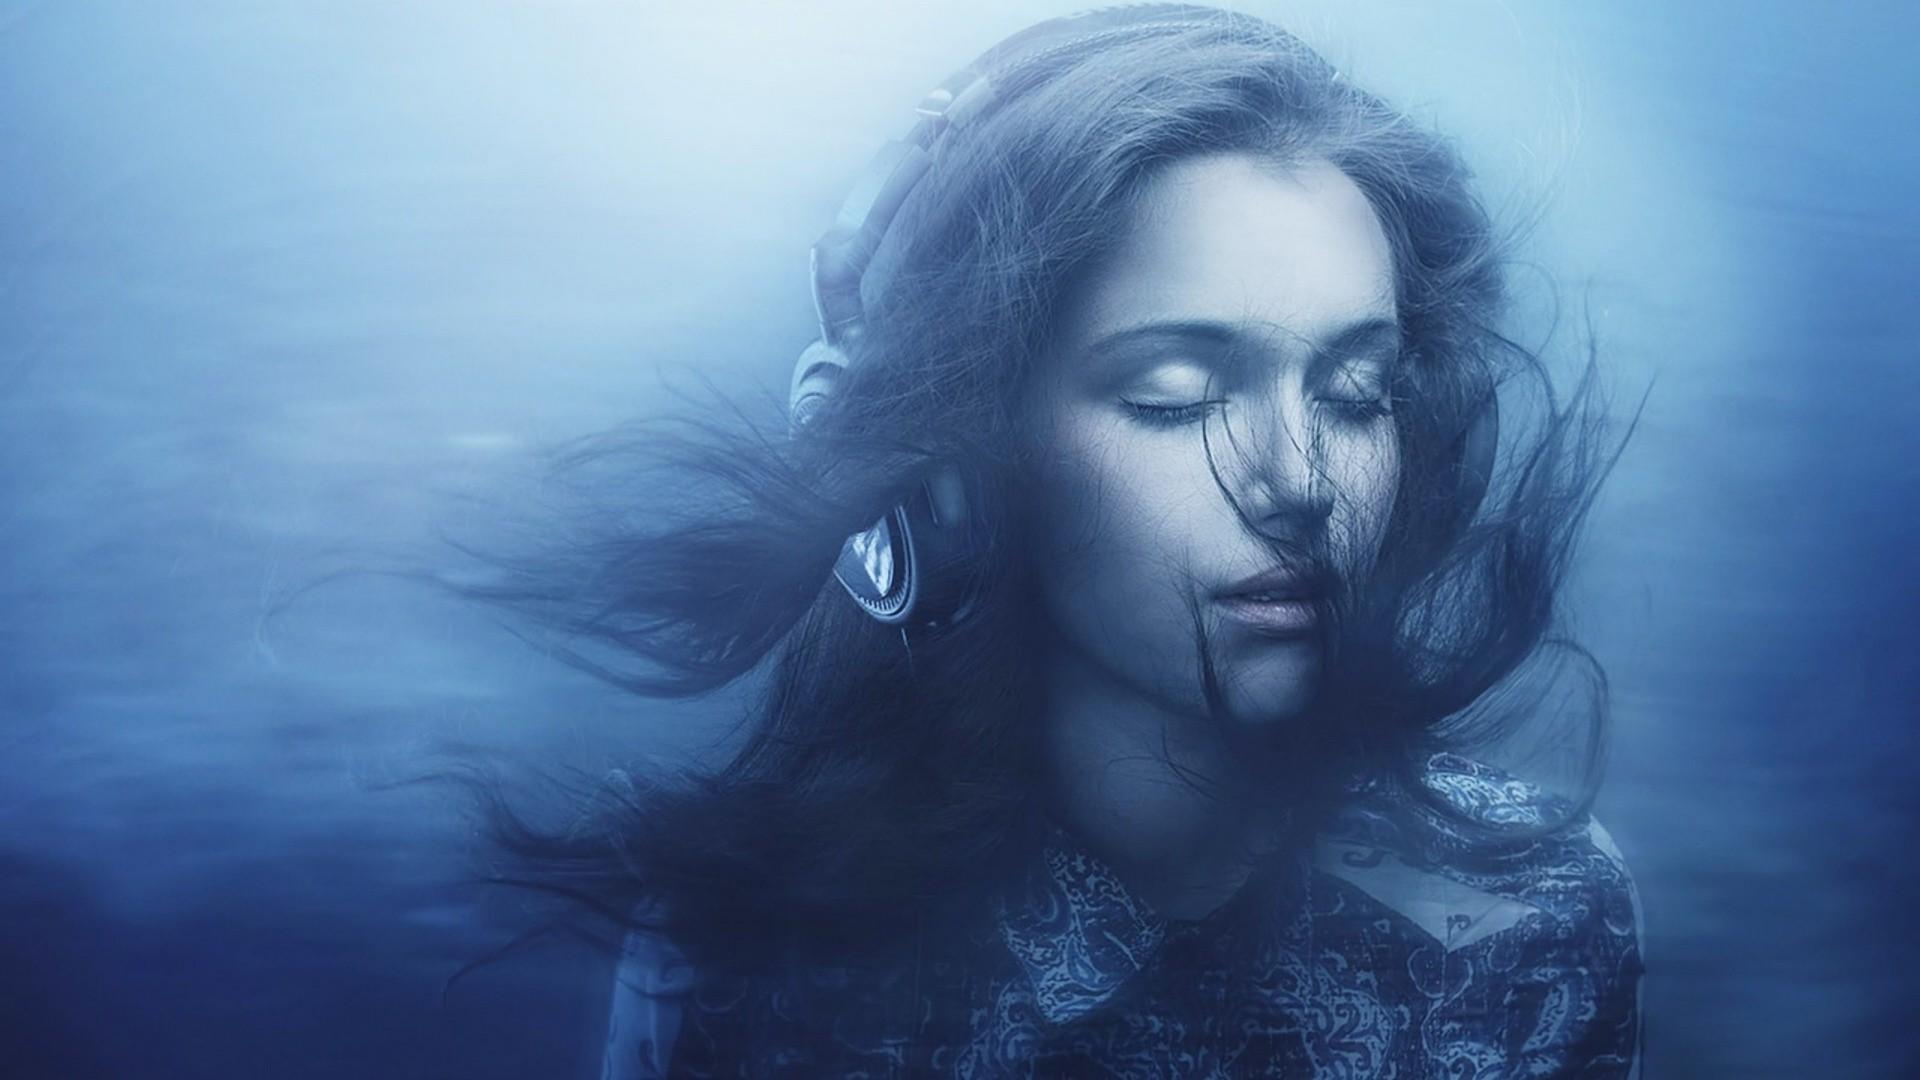 Water Girl desktop wallpapers and stock photos